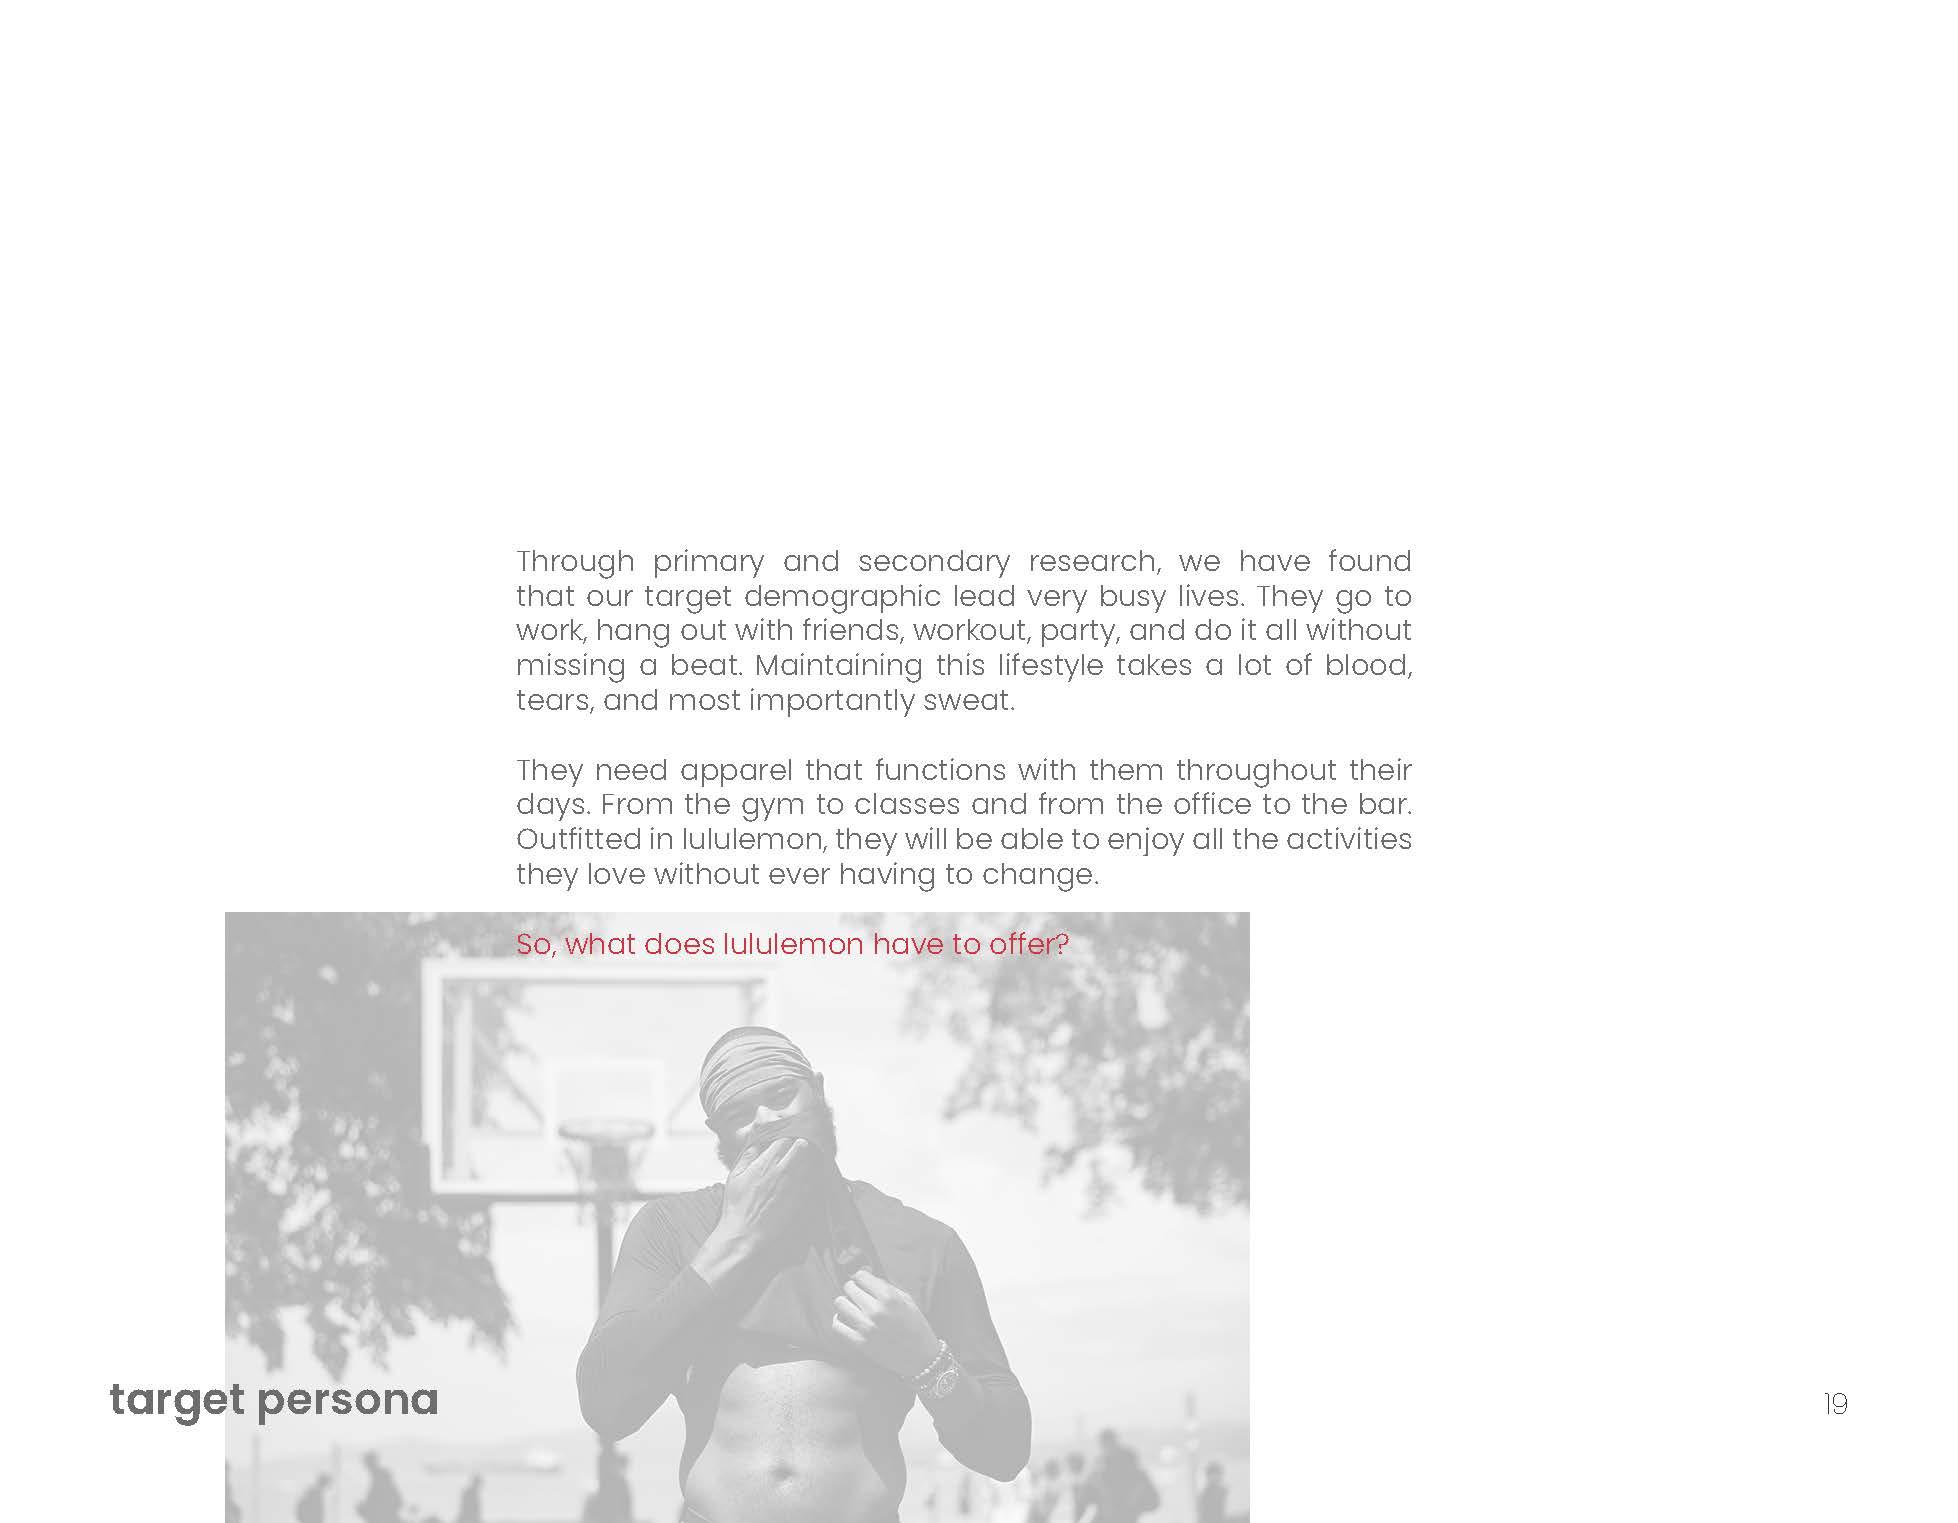 Nellah_FinalPitchBook_Portfolio_lululemon_Page_19.jpg